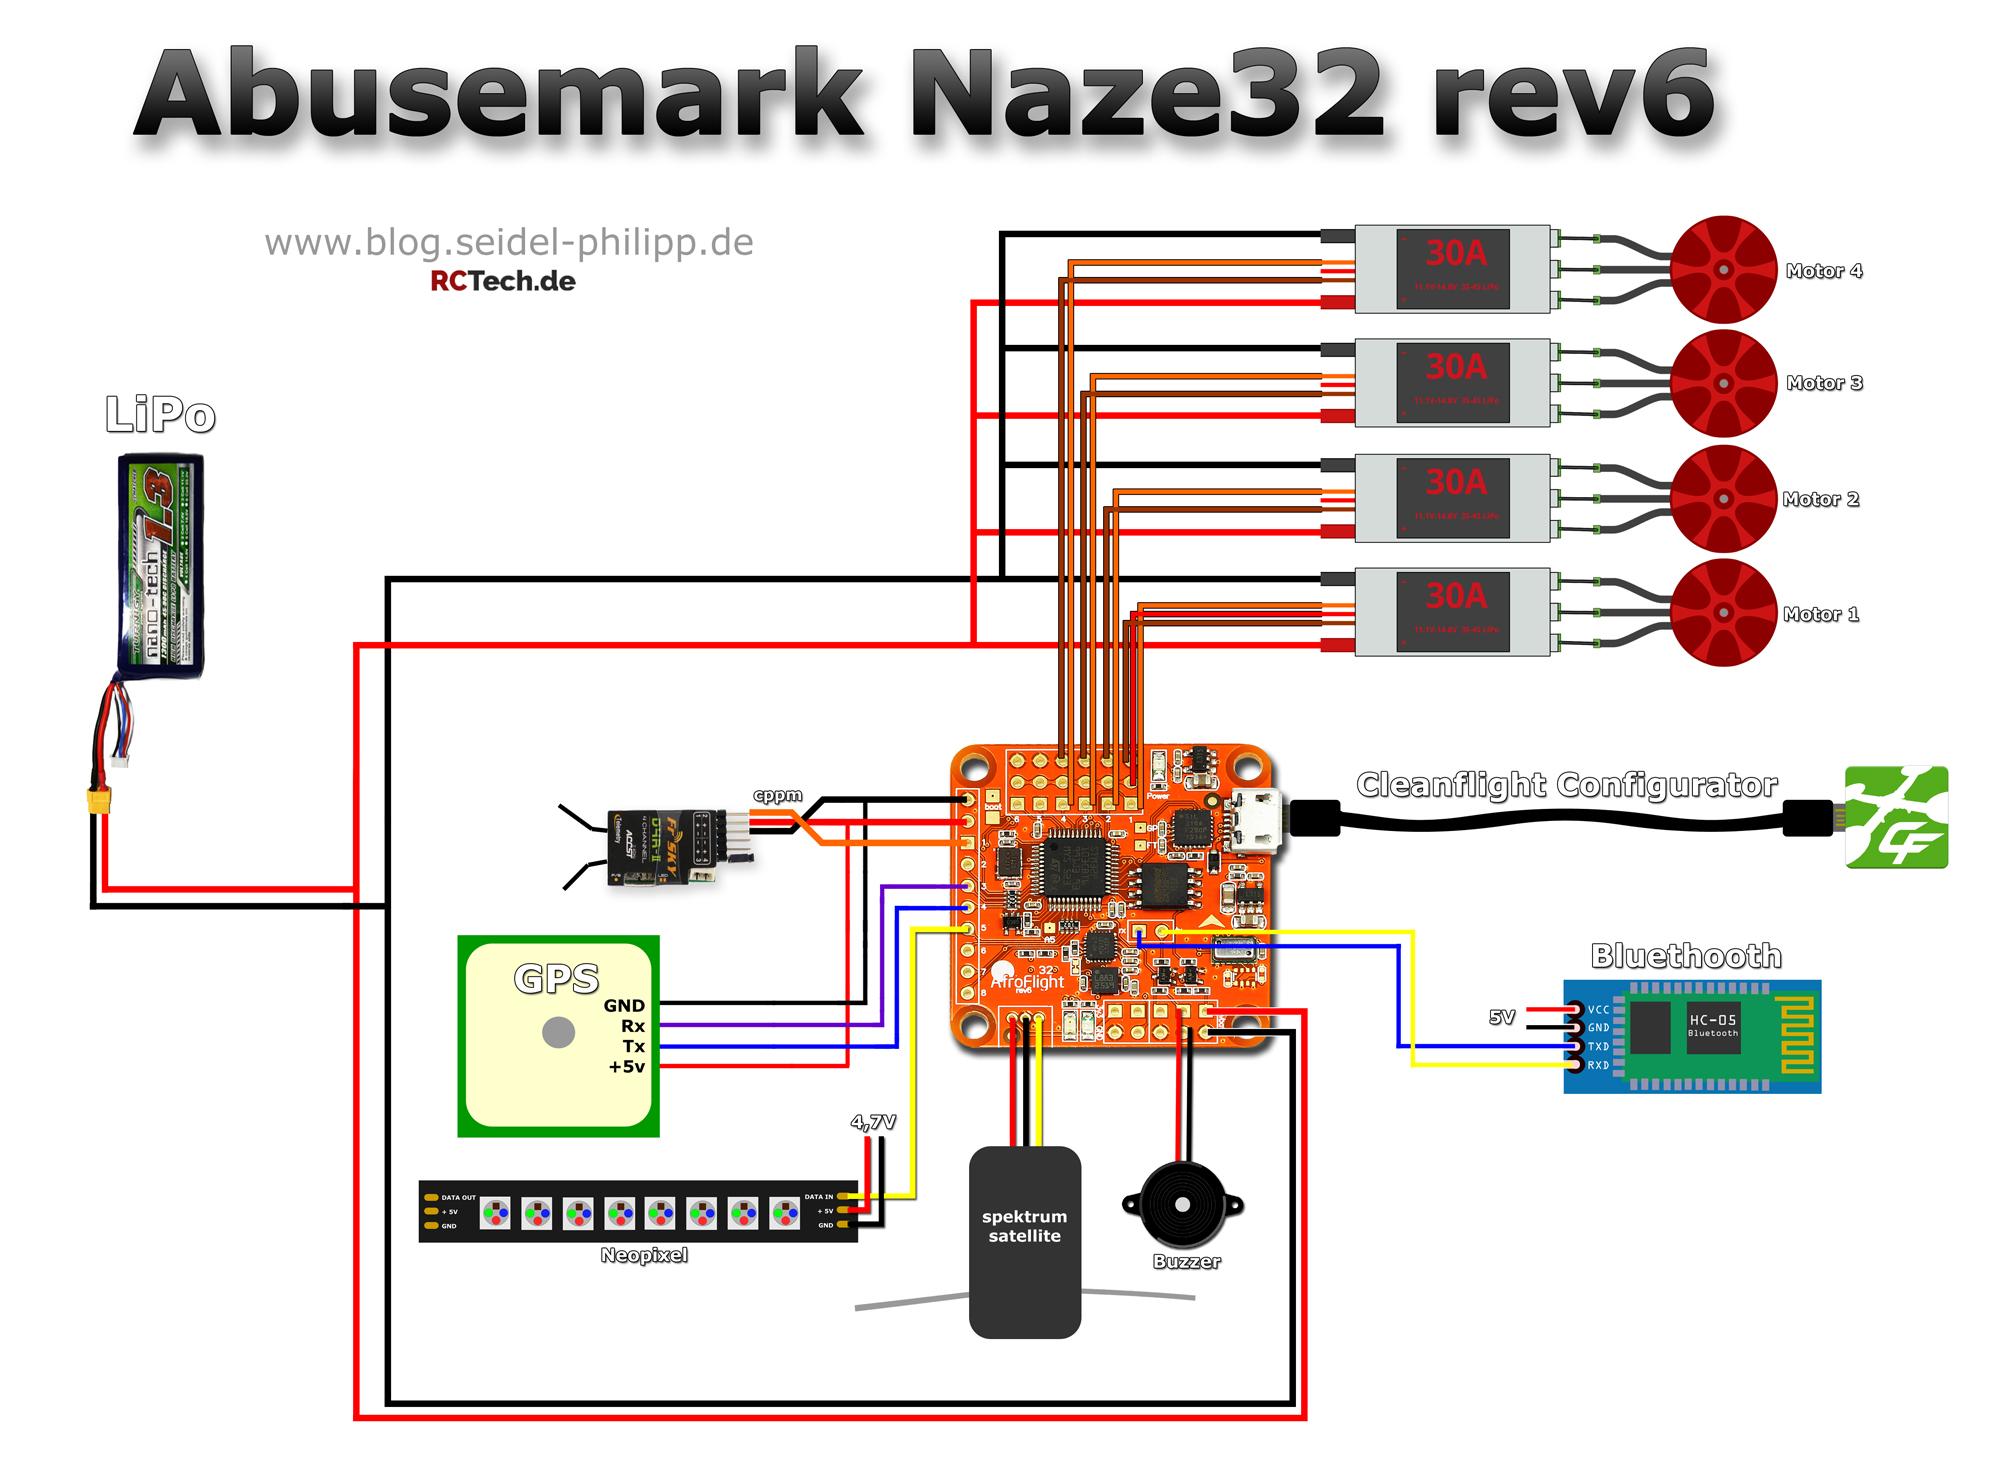 hight resolution of mazda 6 wiring diagram mazda free engine image for user naze32 rev5 wiring diagram naze32 rev6 wiring diagram